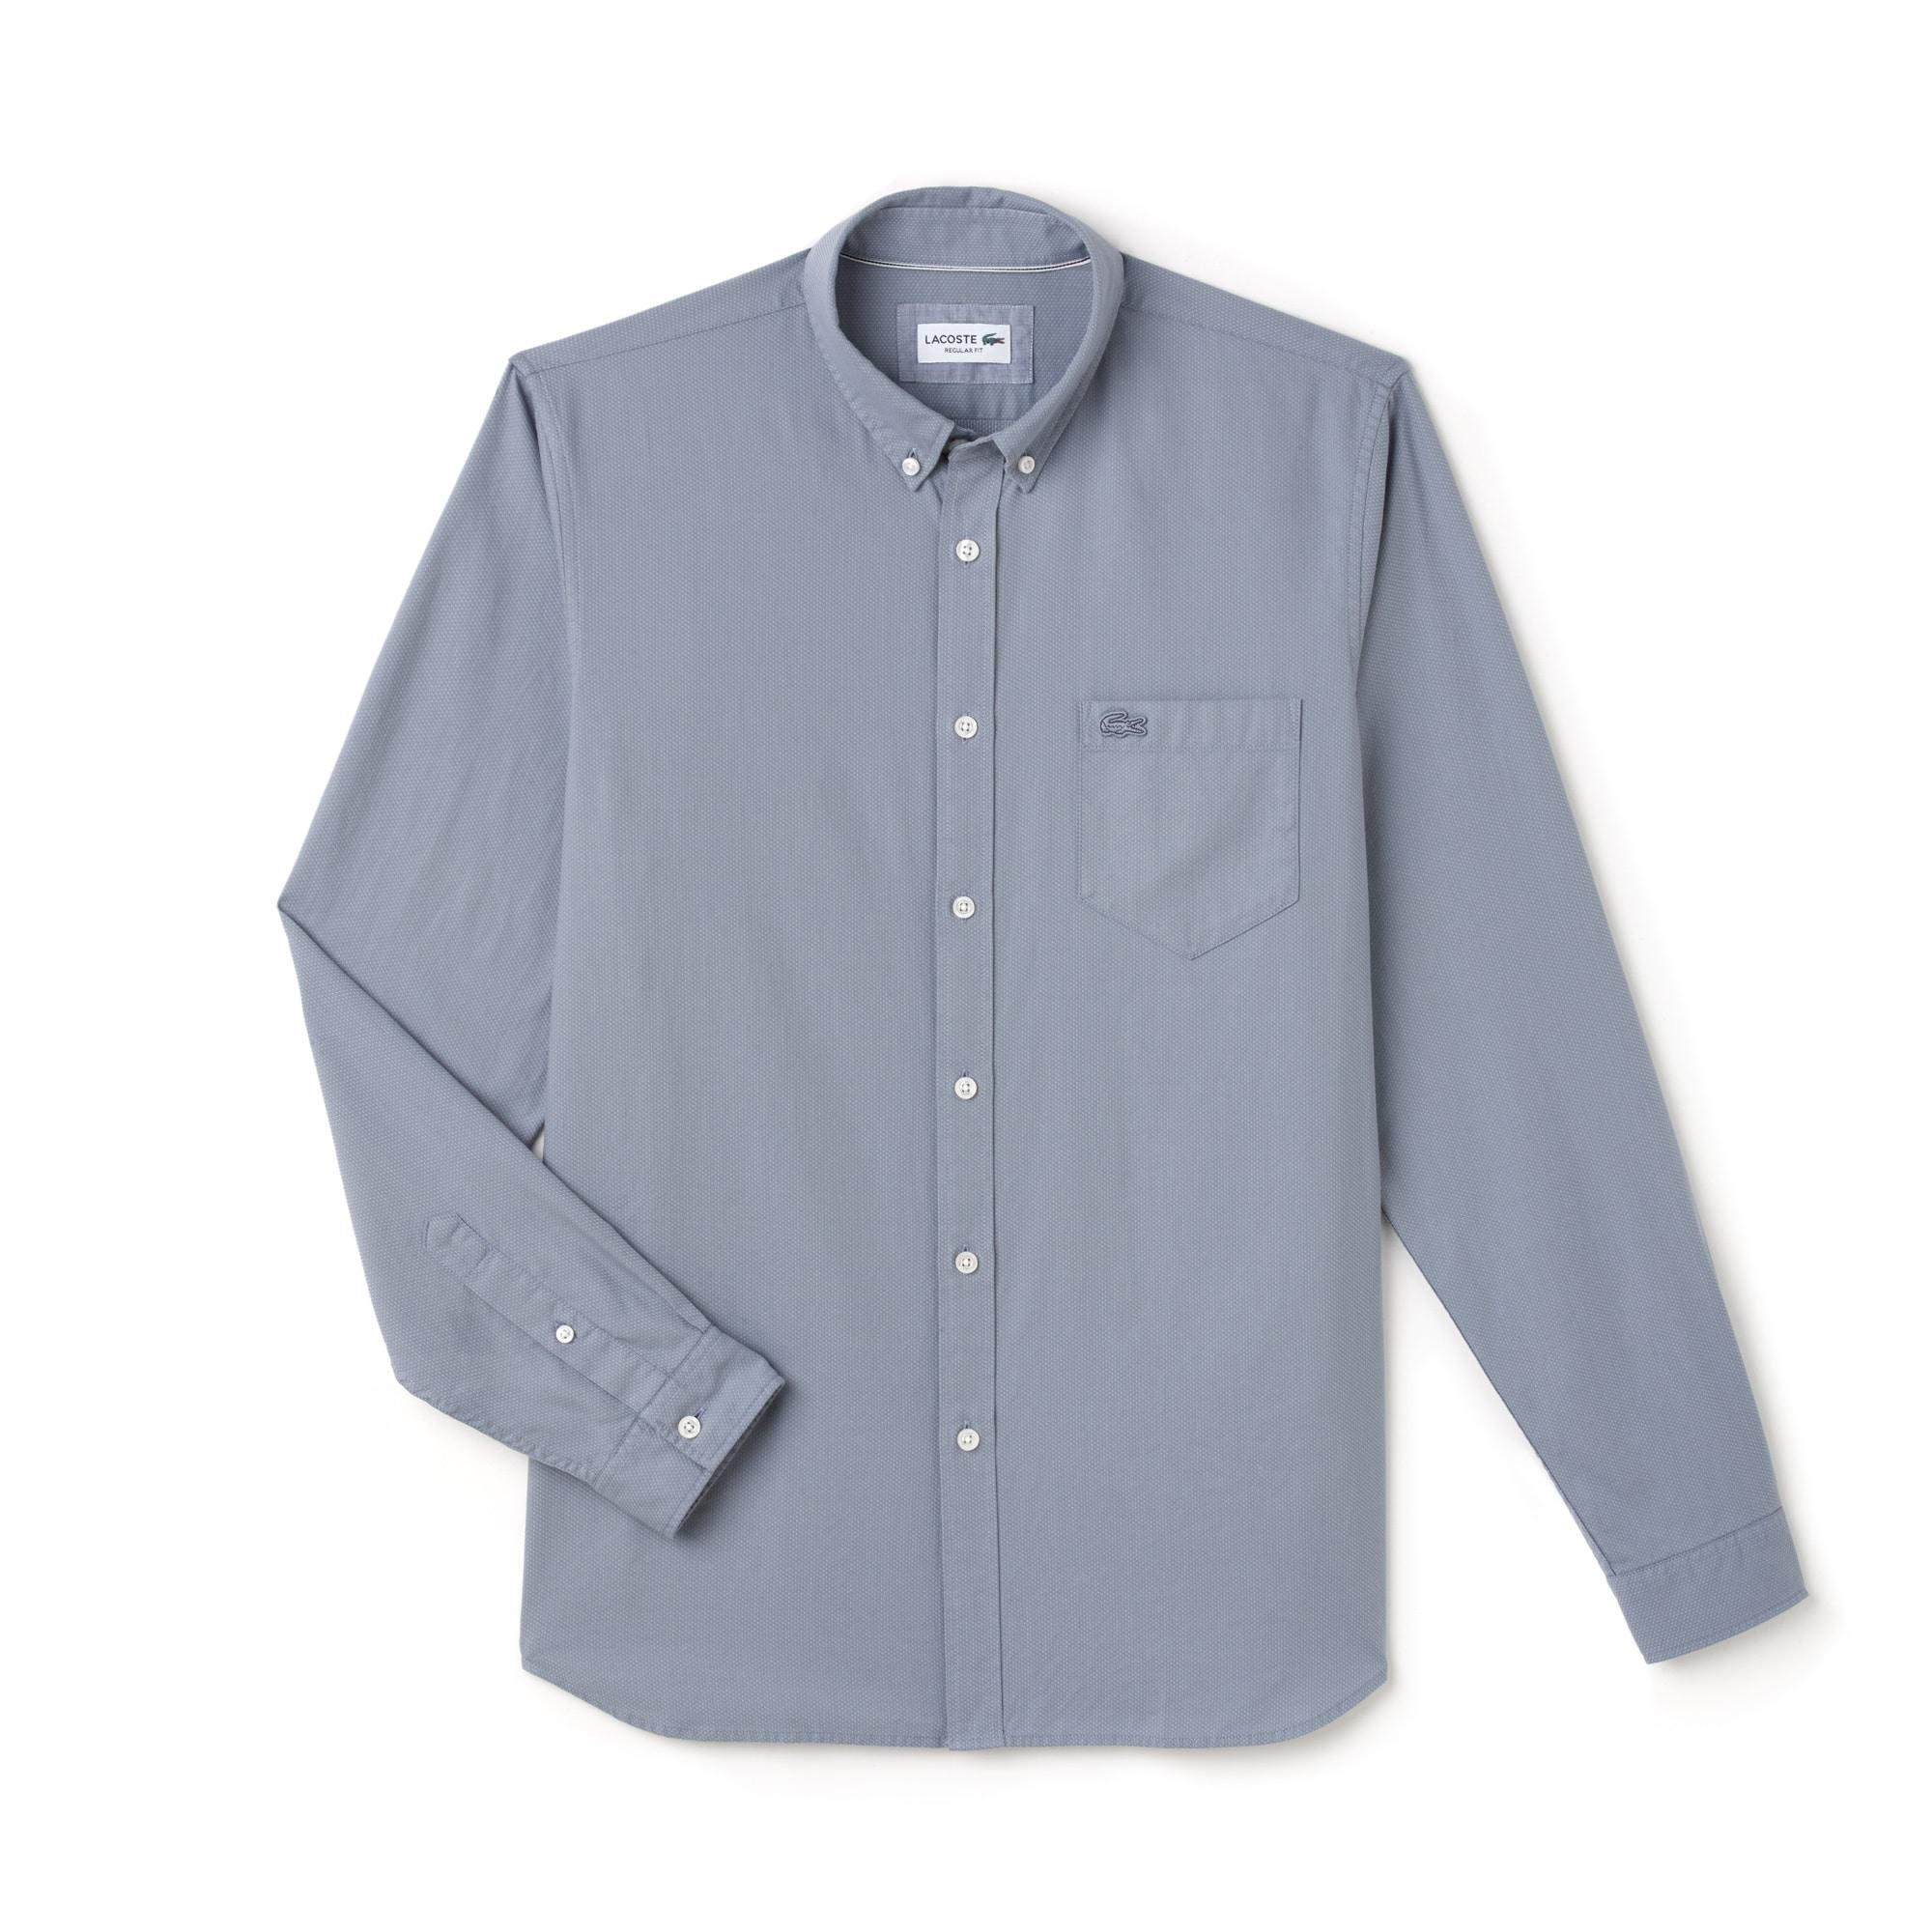 Men's Regular Fit Polka Dot Jacquard Poplin Shirt